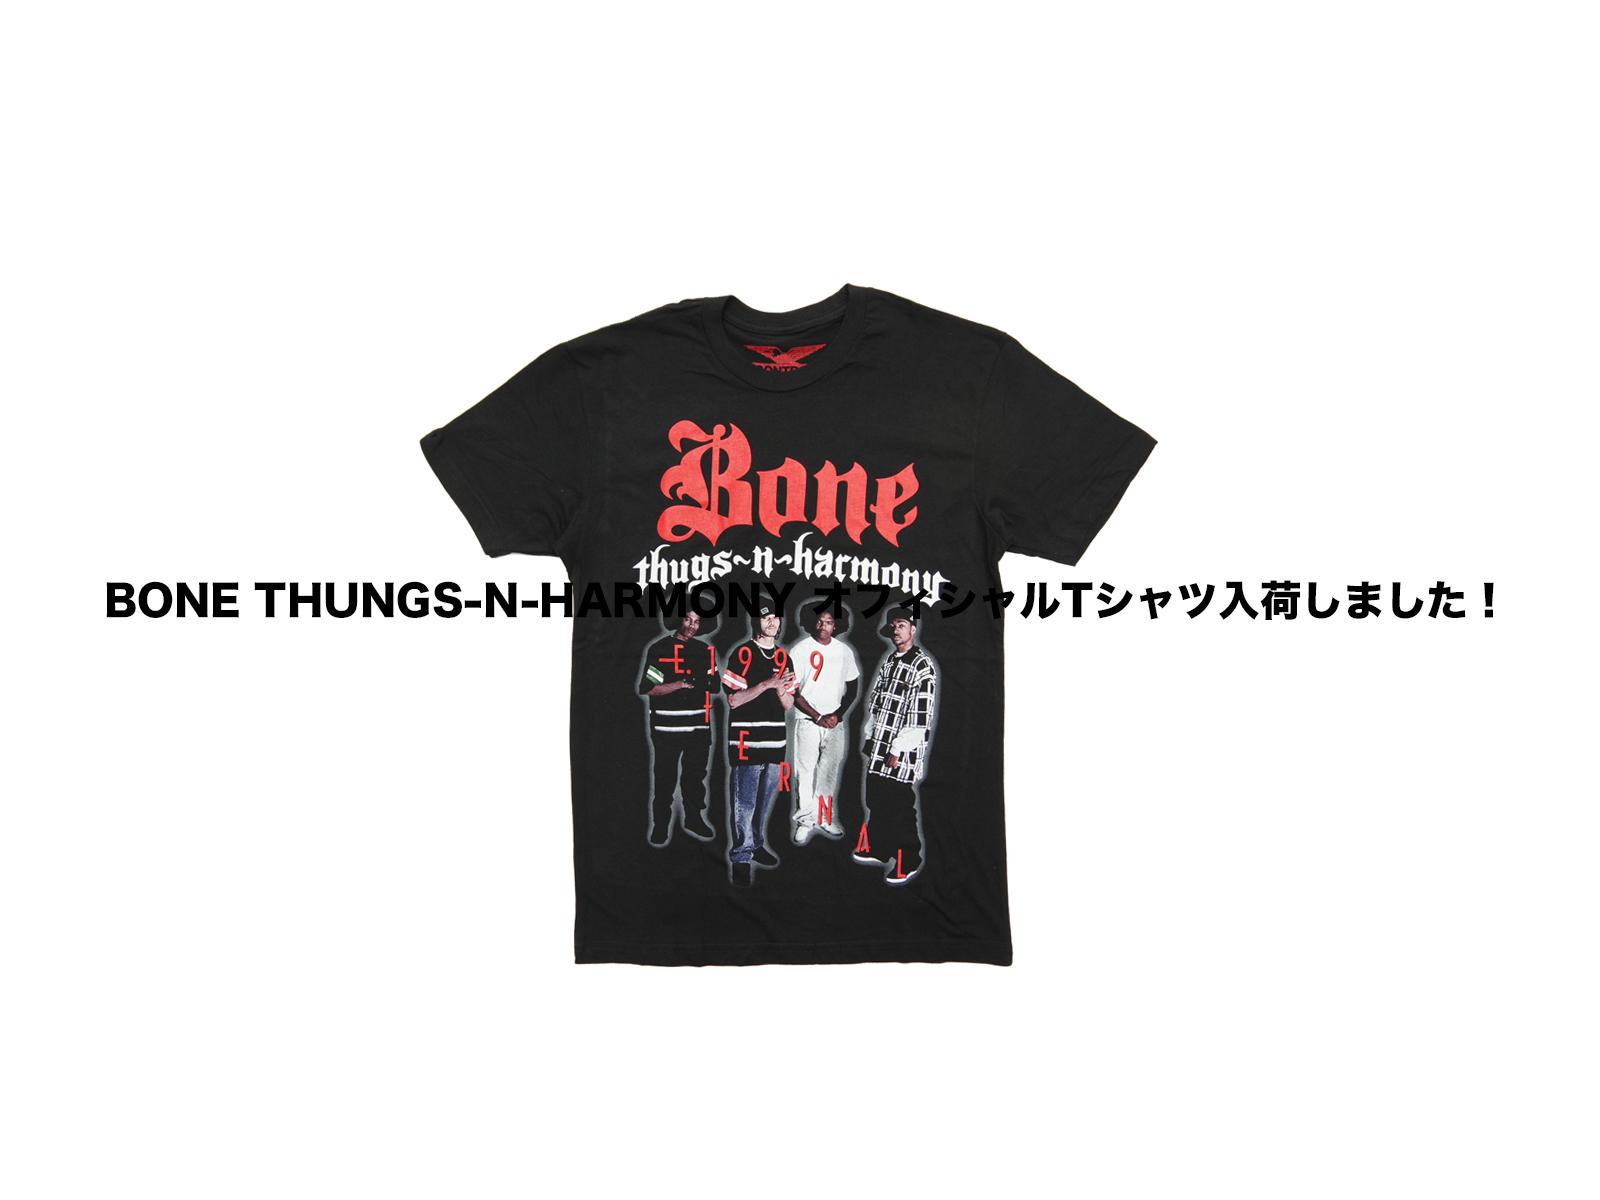 BONE THUNGS-N-HARMONY オフィシャルTシャツ入荷しました!